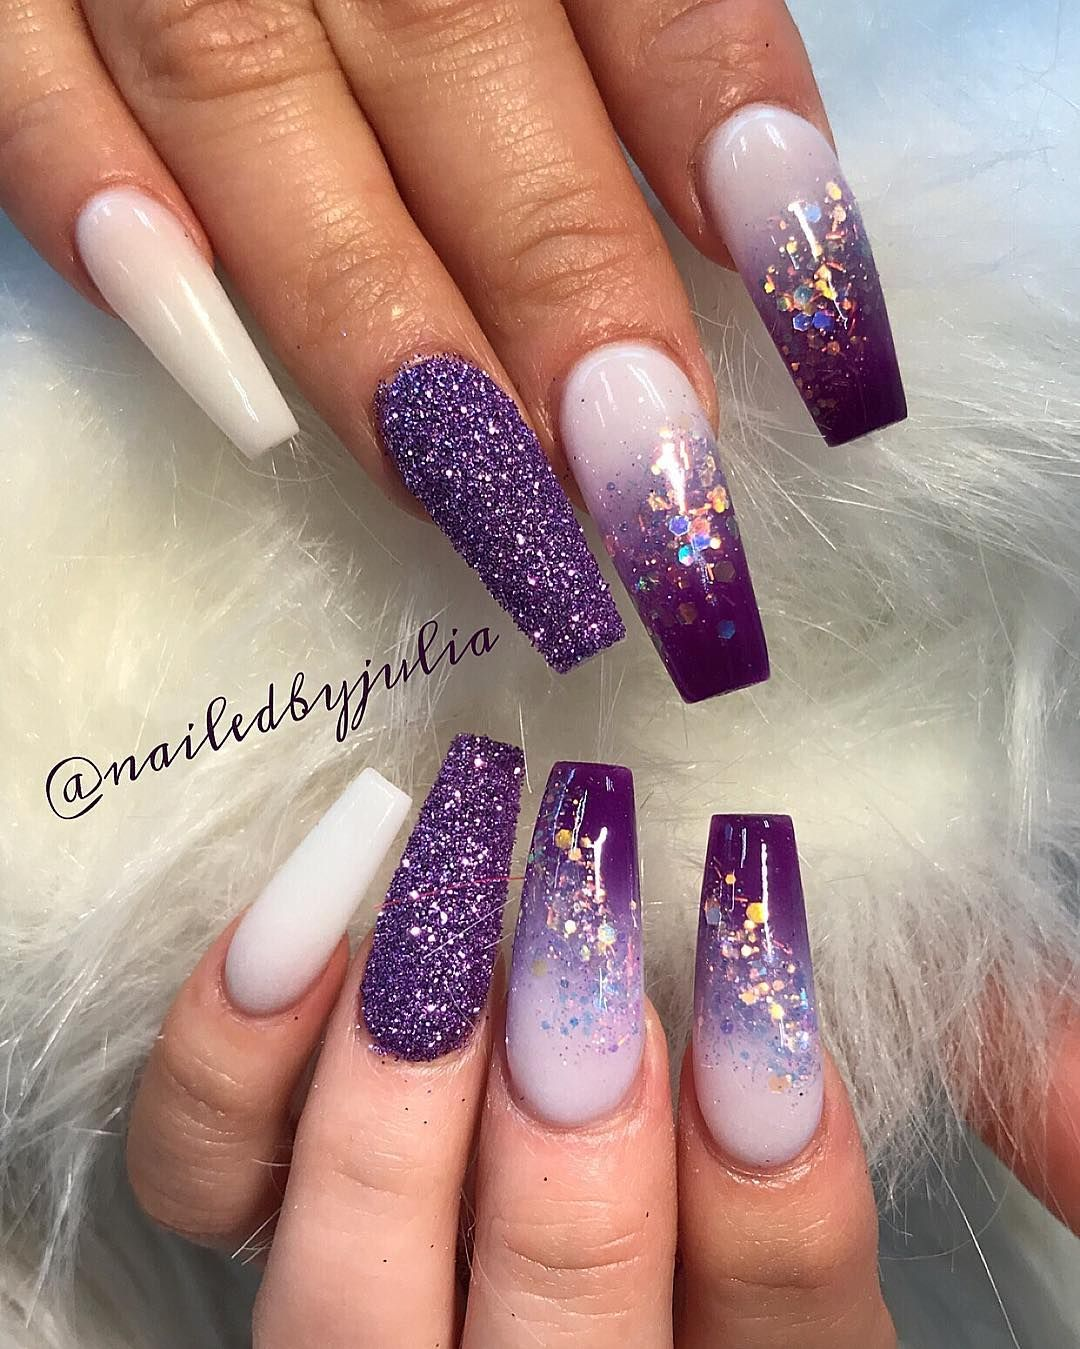 The Salon Inspires Girls Into Getting Purple Ombrenails Coffinnails Encapsulatednails Allacrylic Purple Acrylic Nails Purple Nail Art Purple Ombre Nails